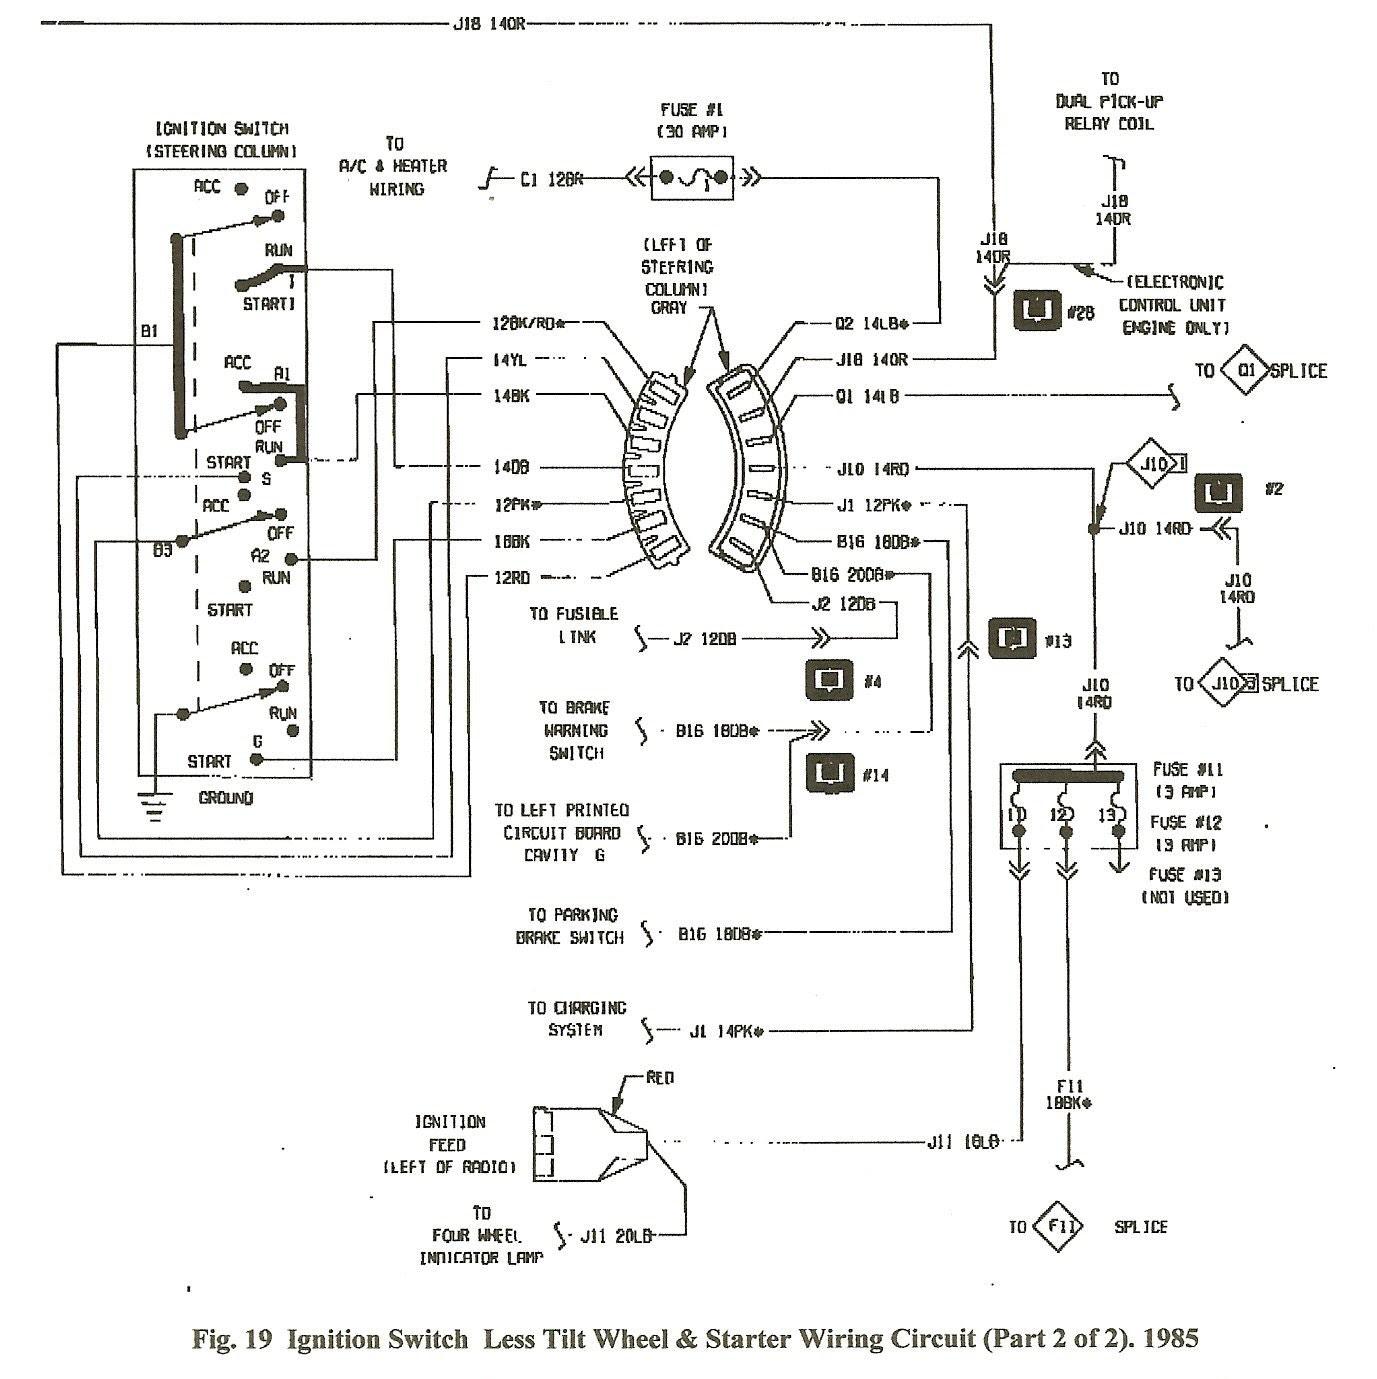 1986 Dodge Ignition Wiring Diagram